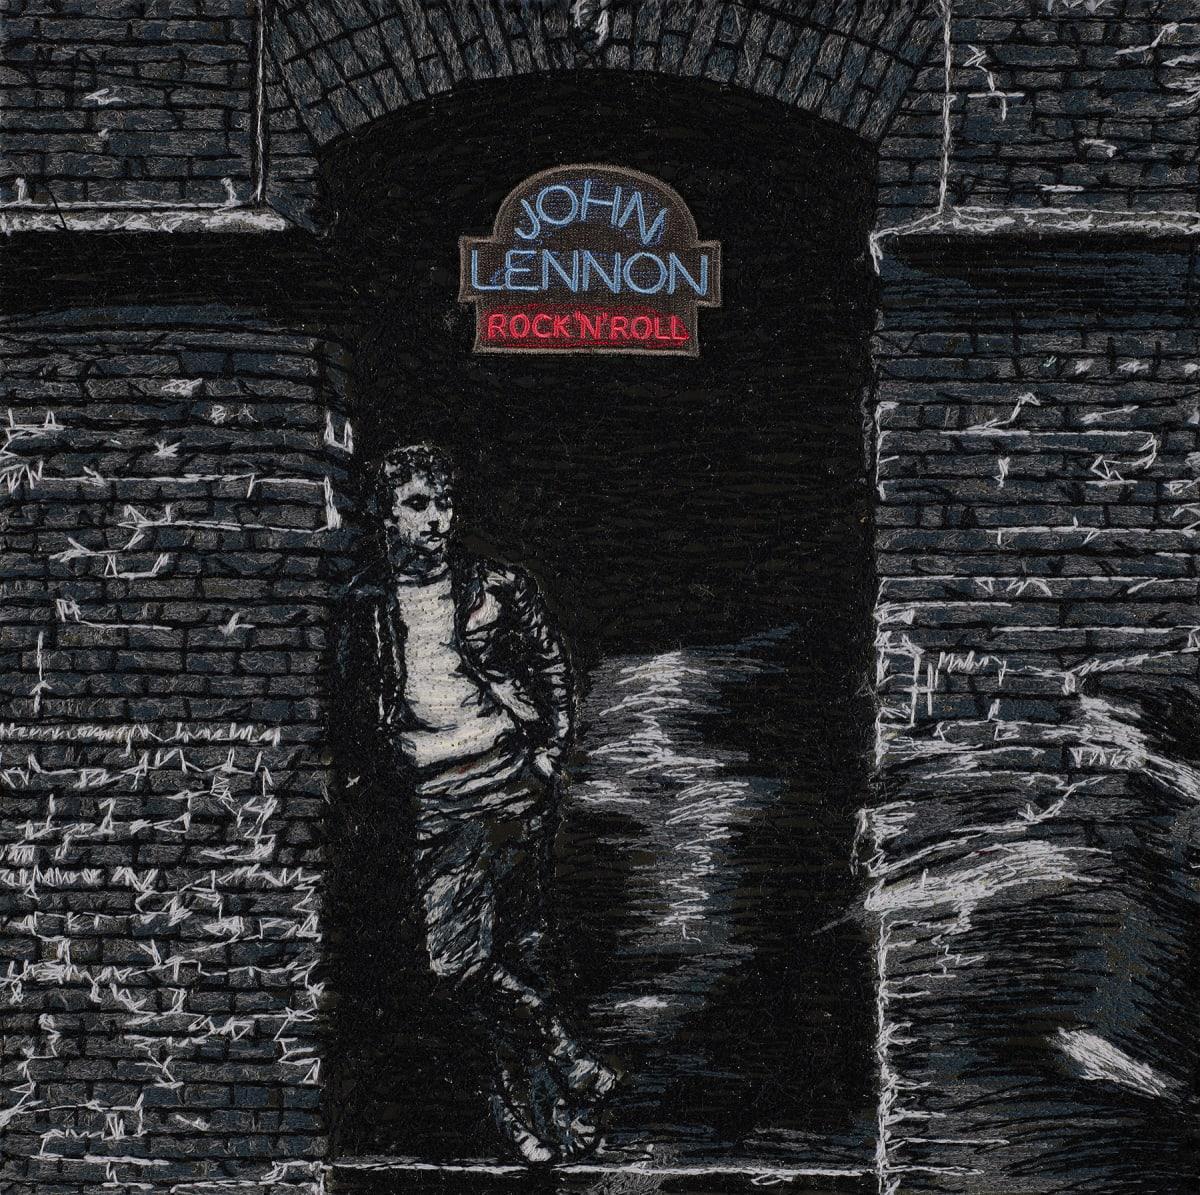 Stephen Wilson, Rock'n'Roll, John Lennon, 2020